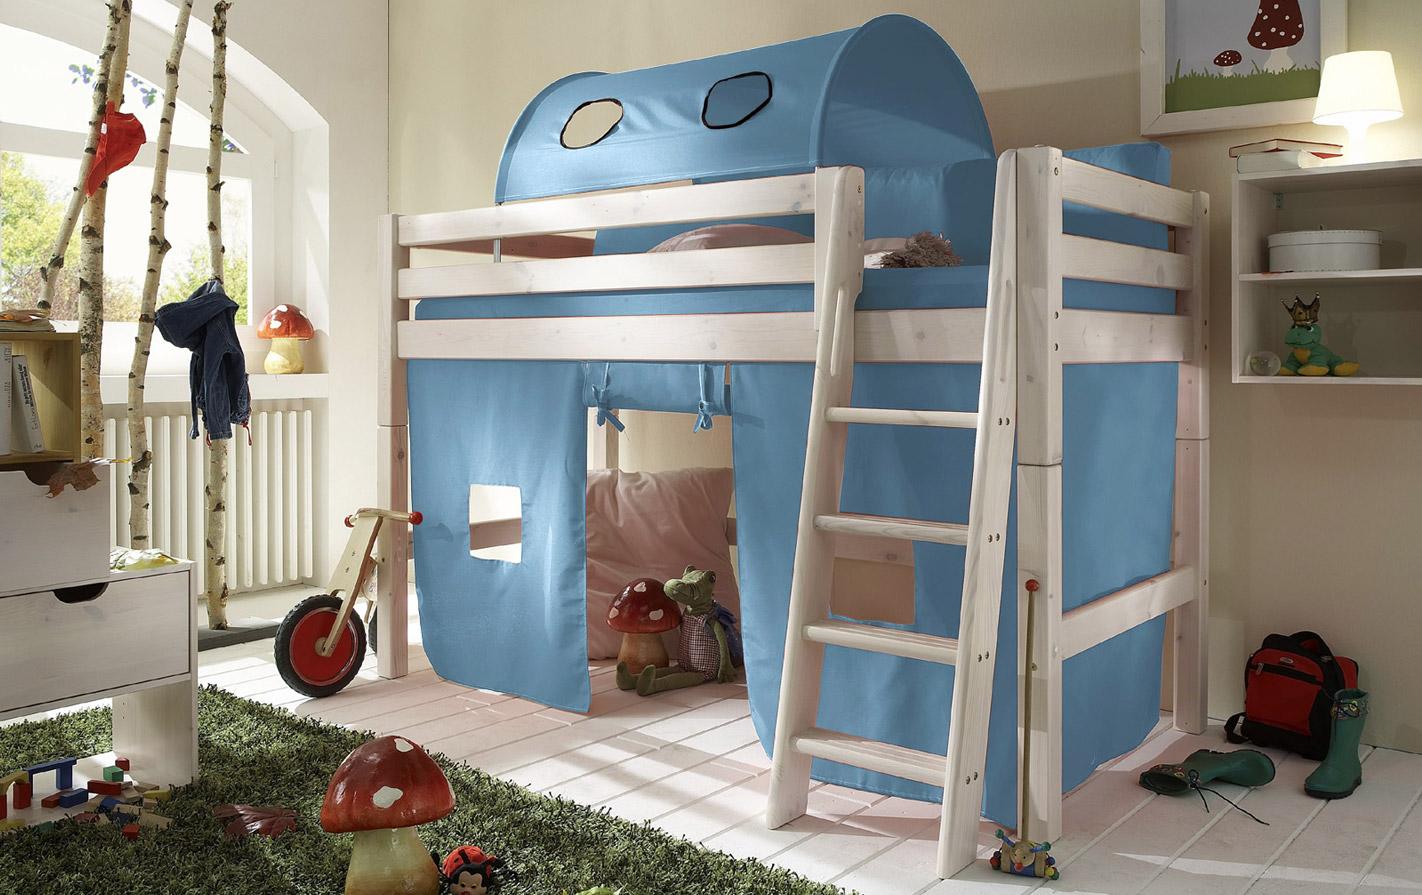 Spielvorhang Kids Paradise Mini in uni hellblau